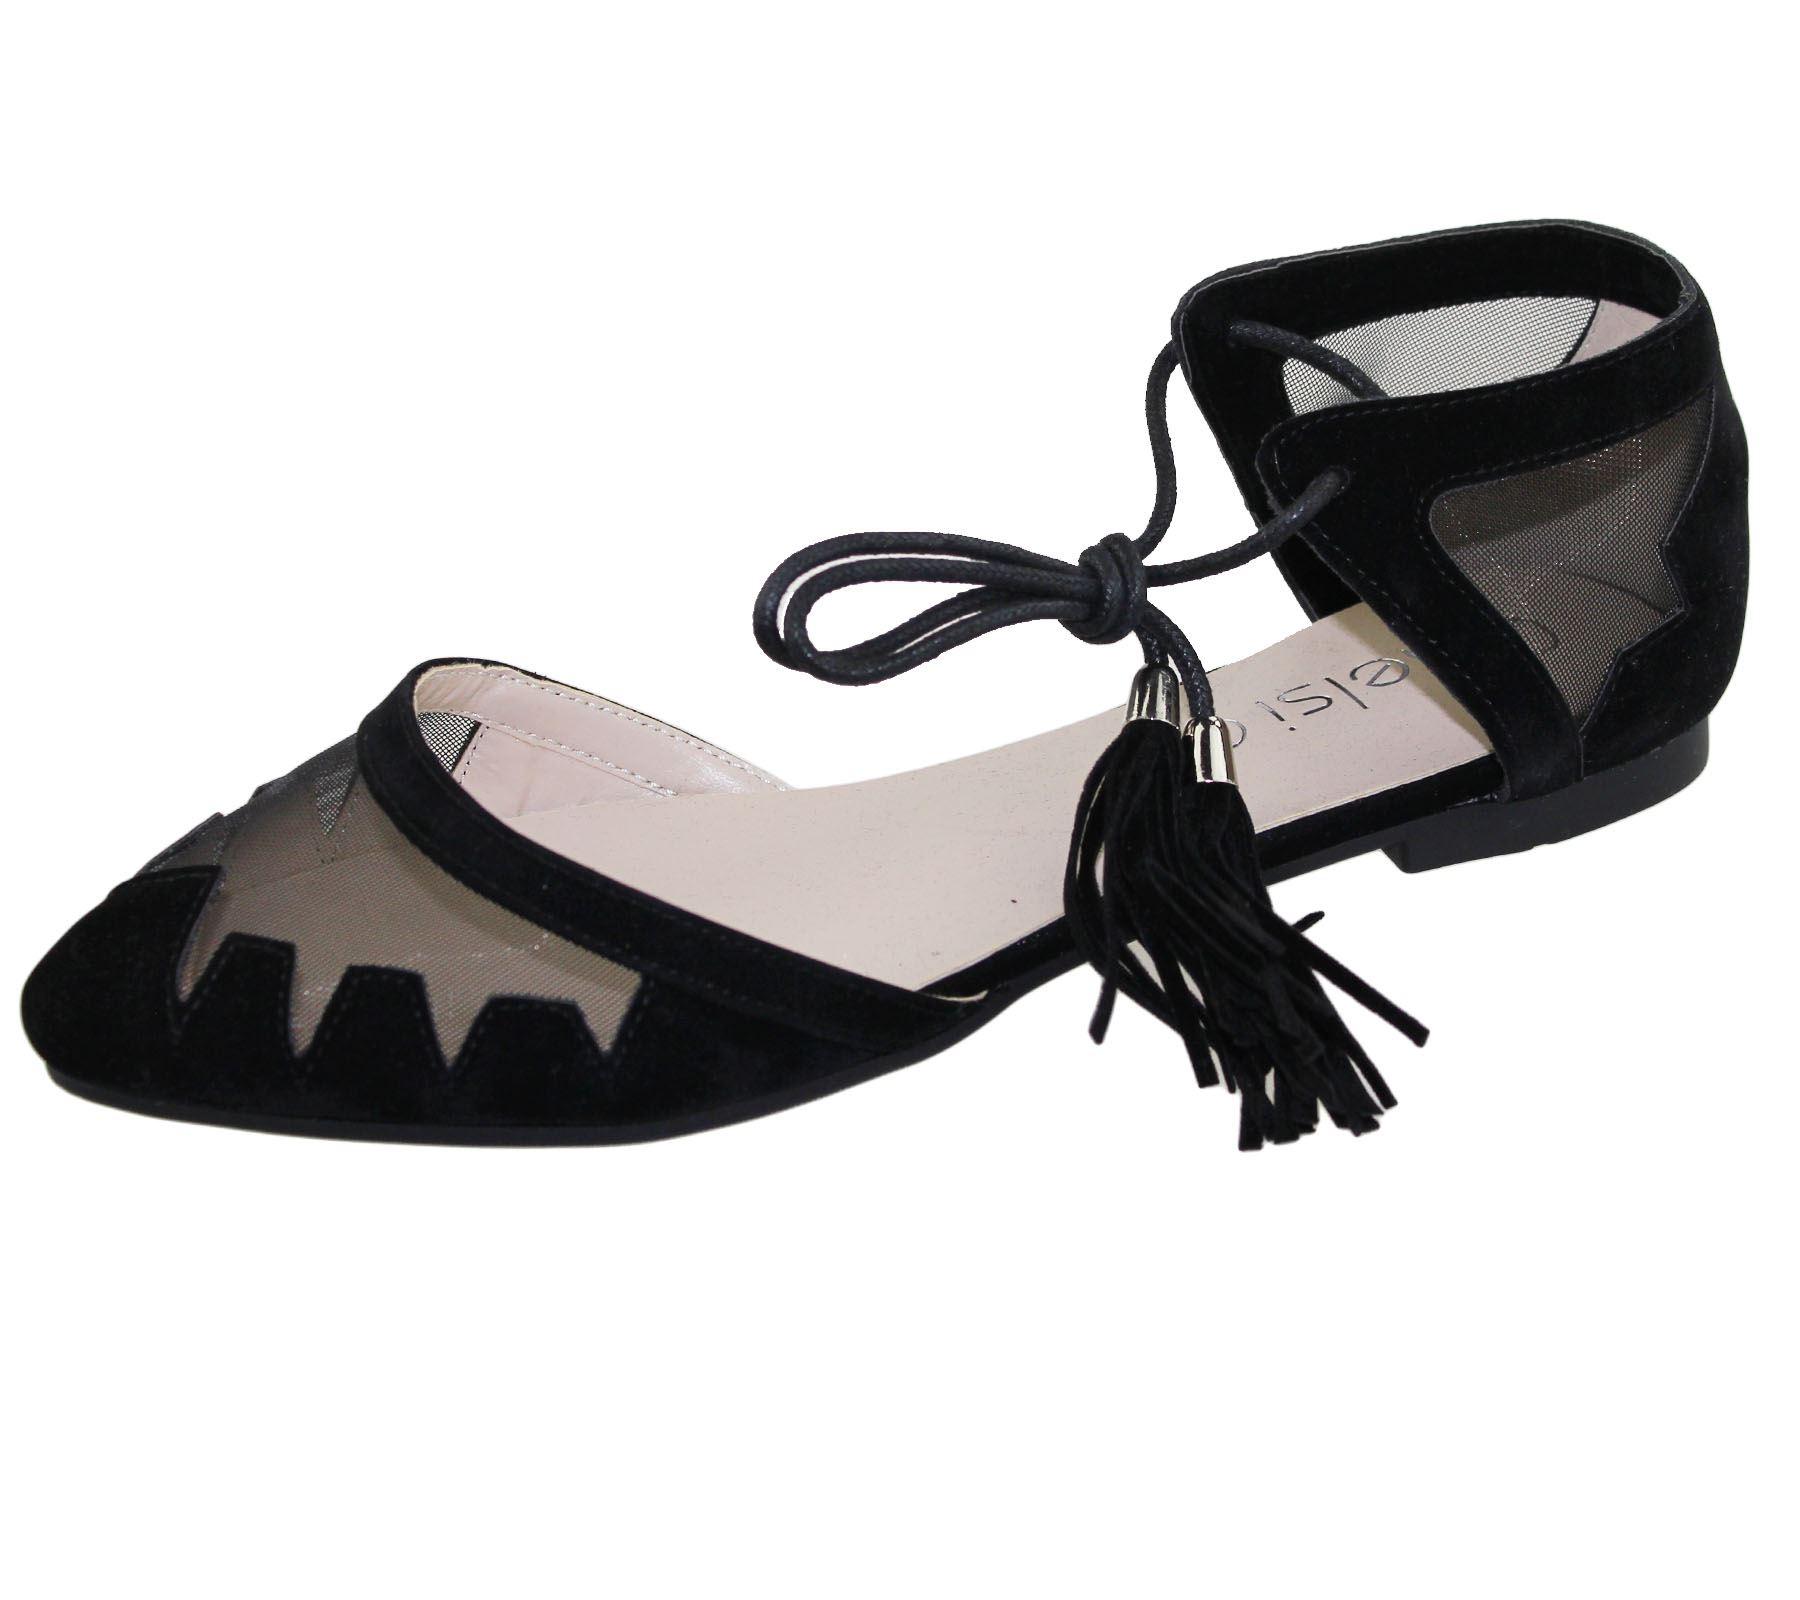 Womens-Flat-Ballerina-Dolly-Pumps-Ballet-Ladies-Summer-Mesh-Tassel-Shoes-Sandals thumbnail 38